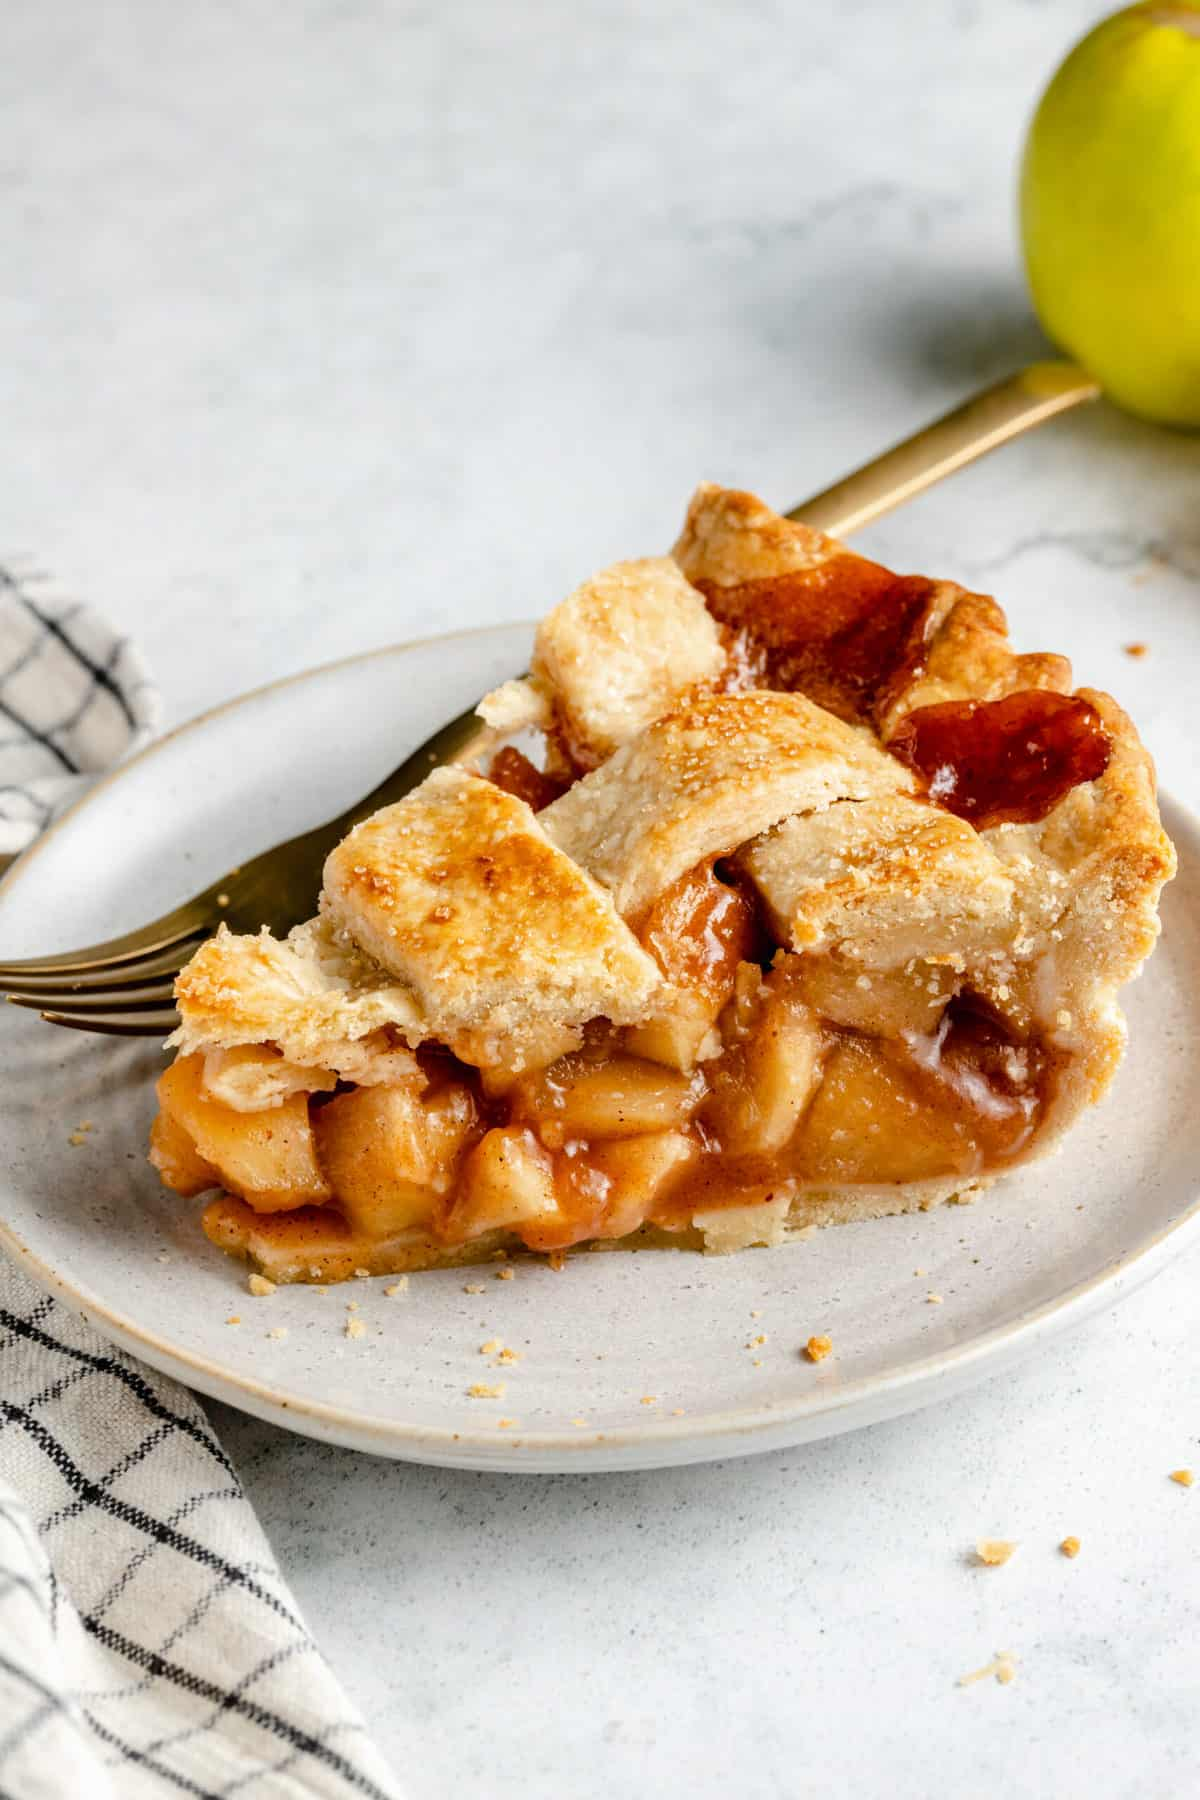 Apple pie slice on a plate.